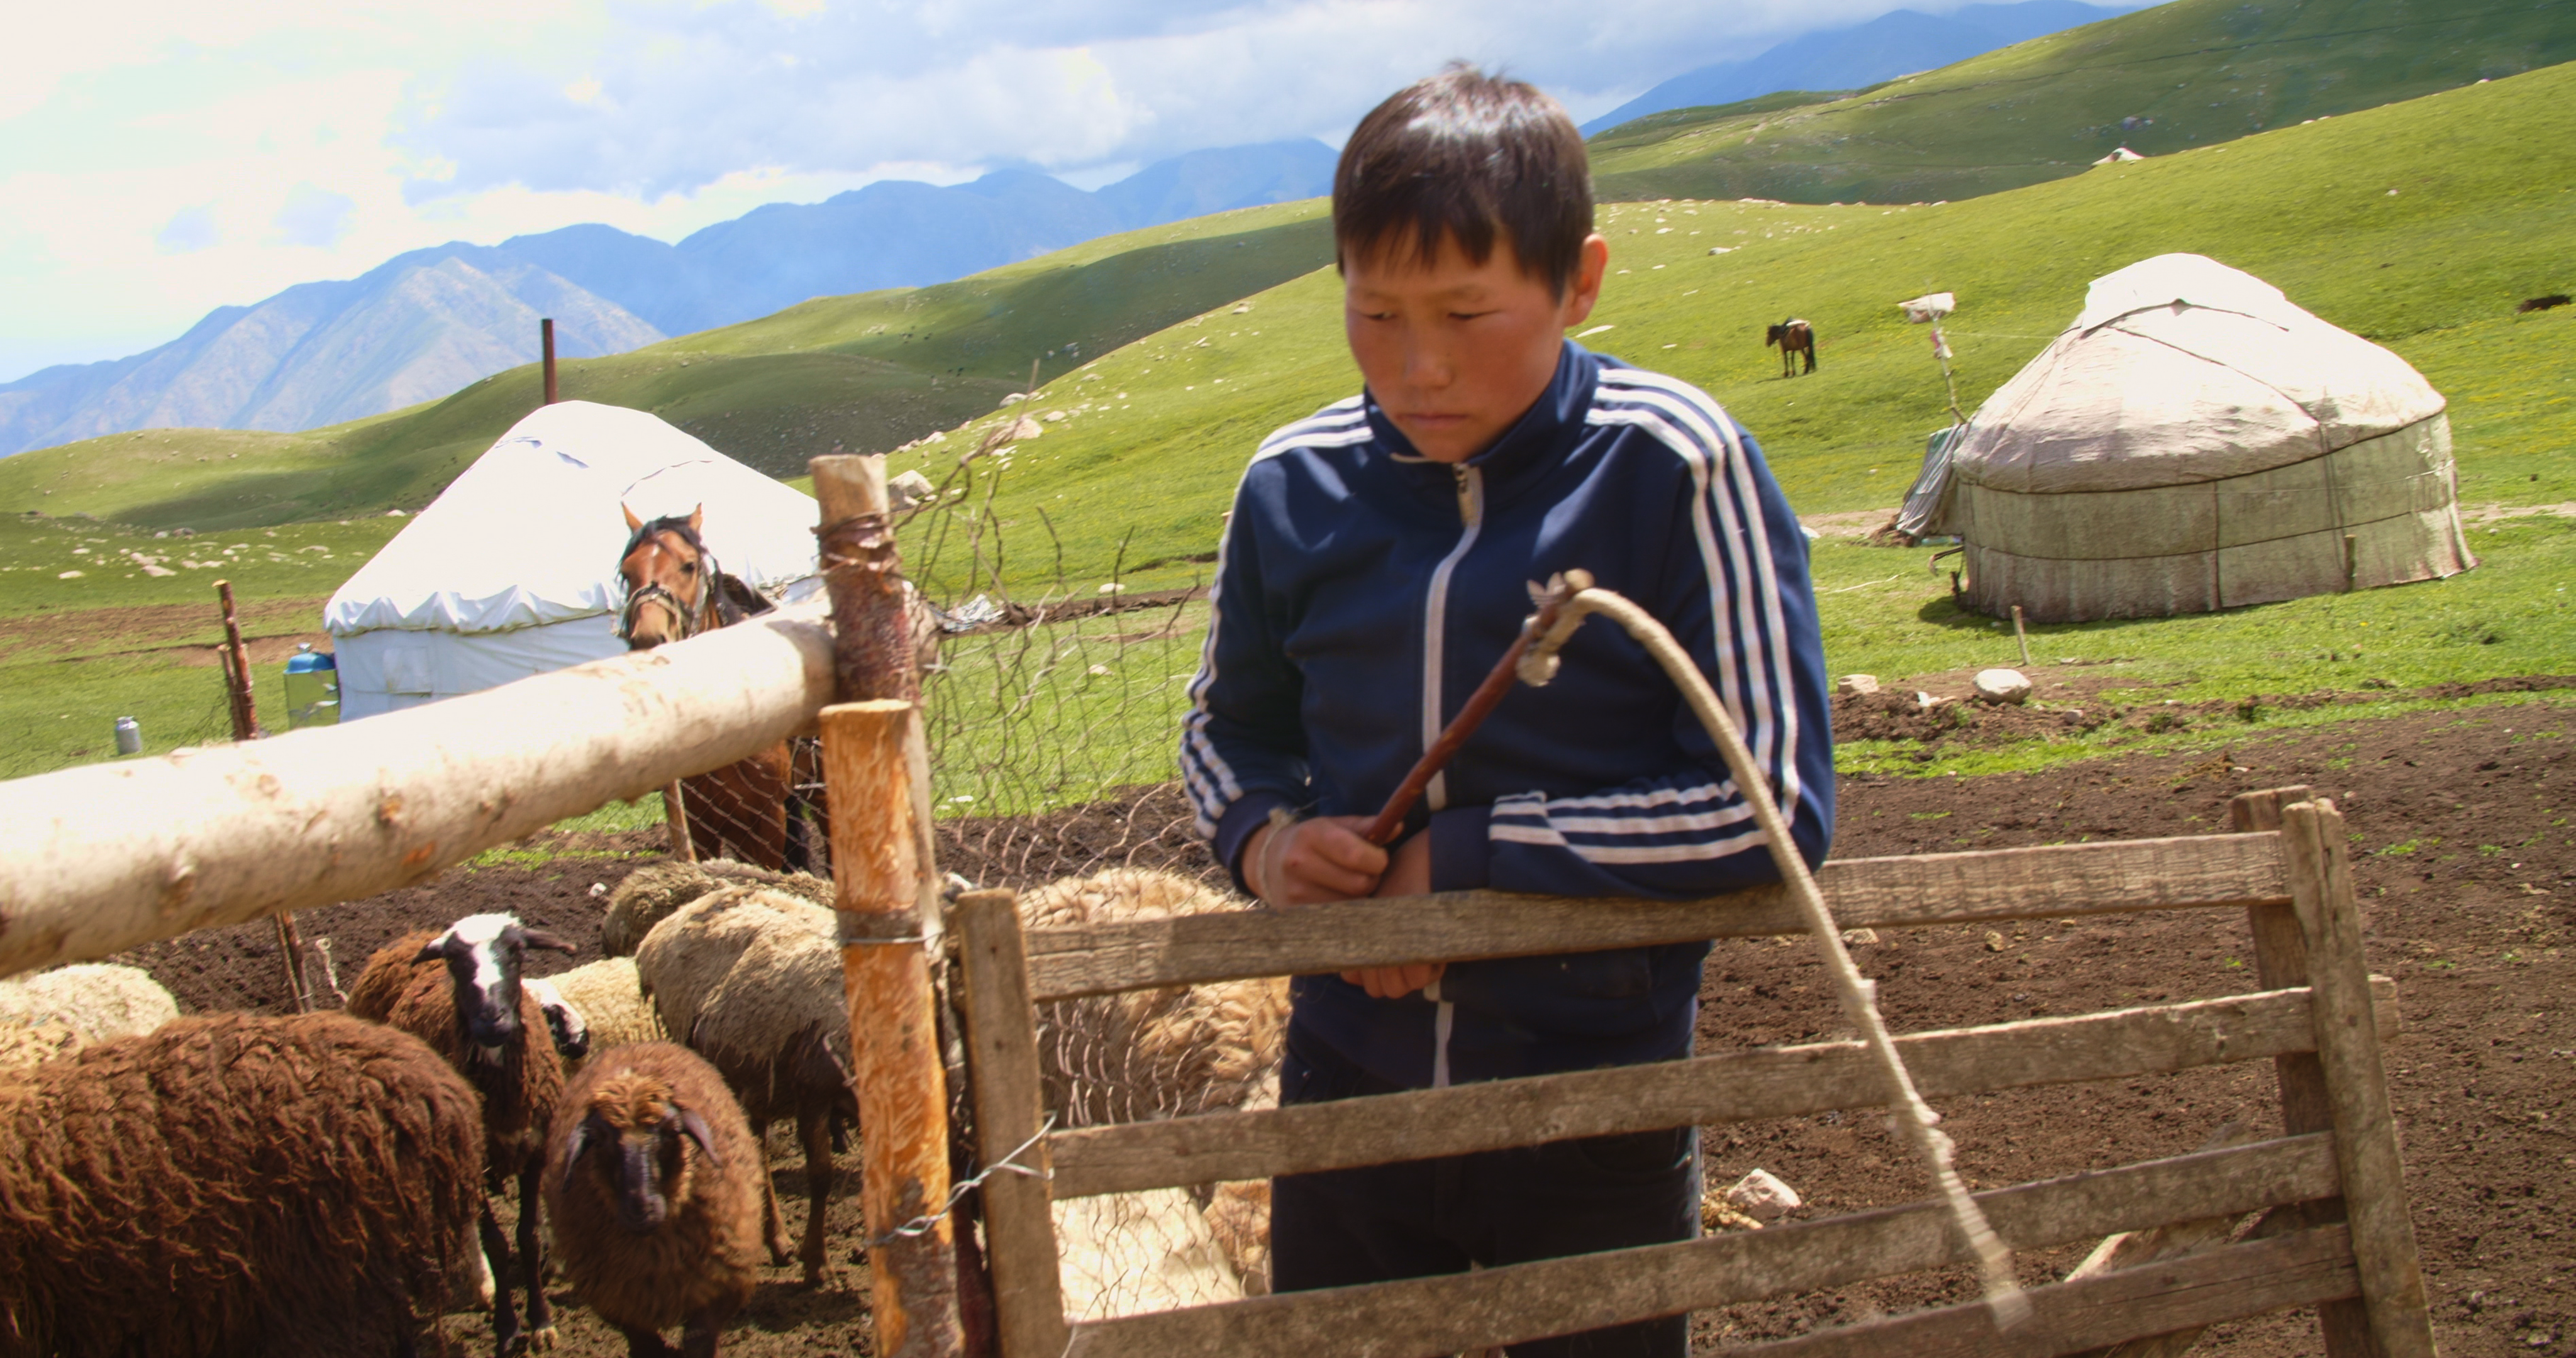 TheBoyFromKyrgyzstan_Stills_1.35.1